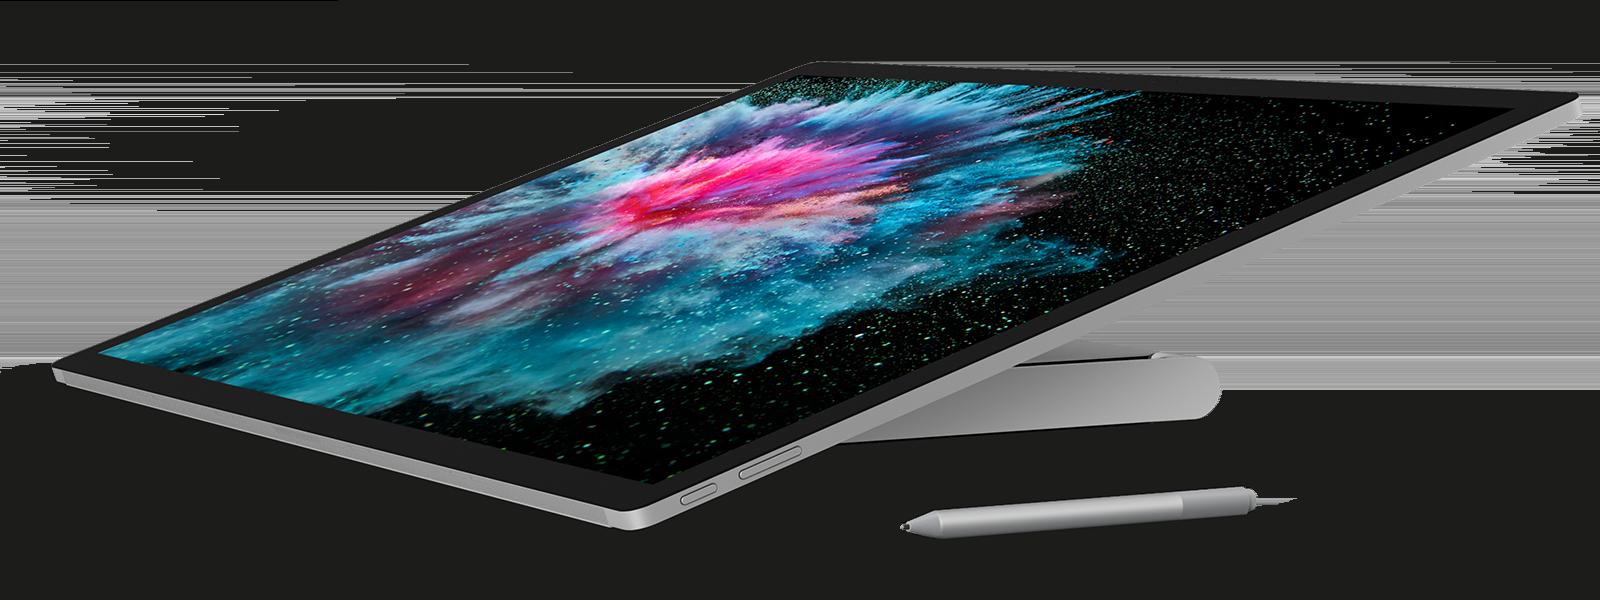 Surface Studio 2 in Studio mode